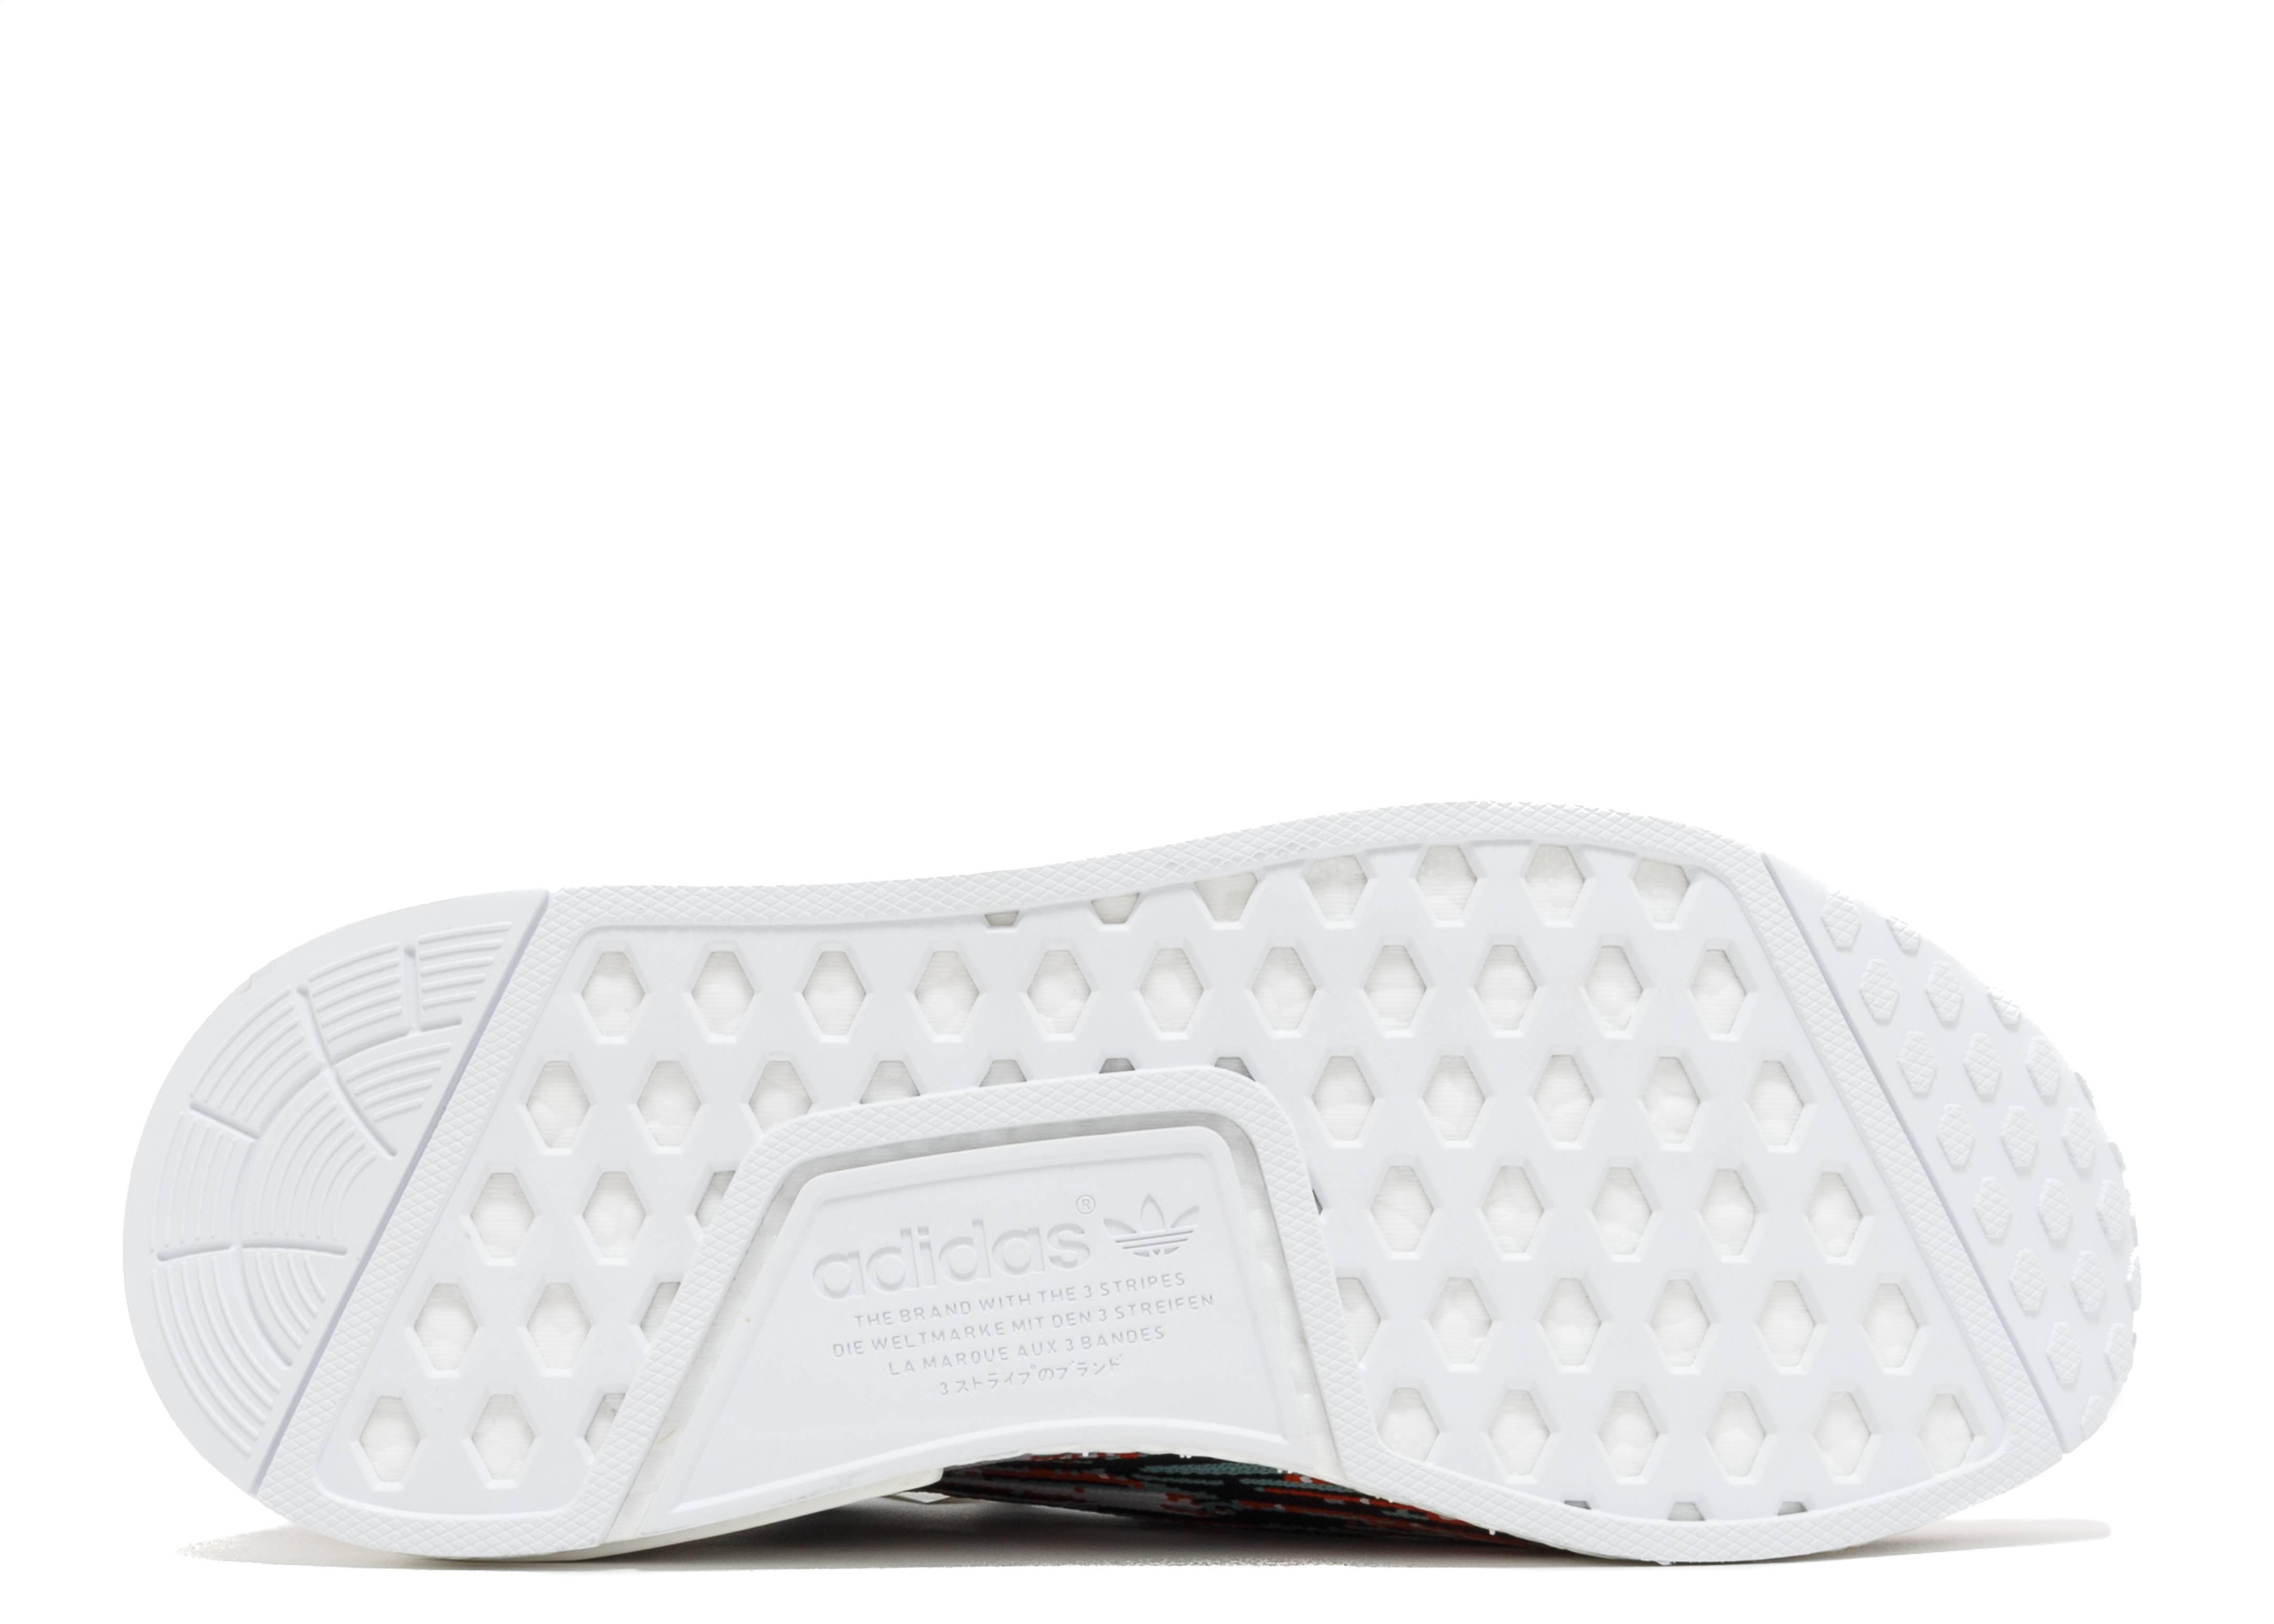 7db1e0114 adidas NMD R1 Sneakersnstuff Datamosh Collegiate Orange - 4